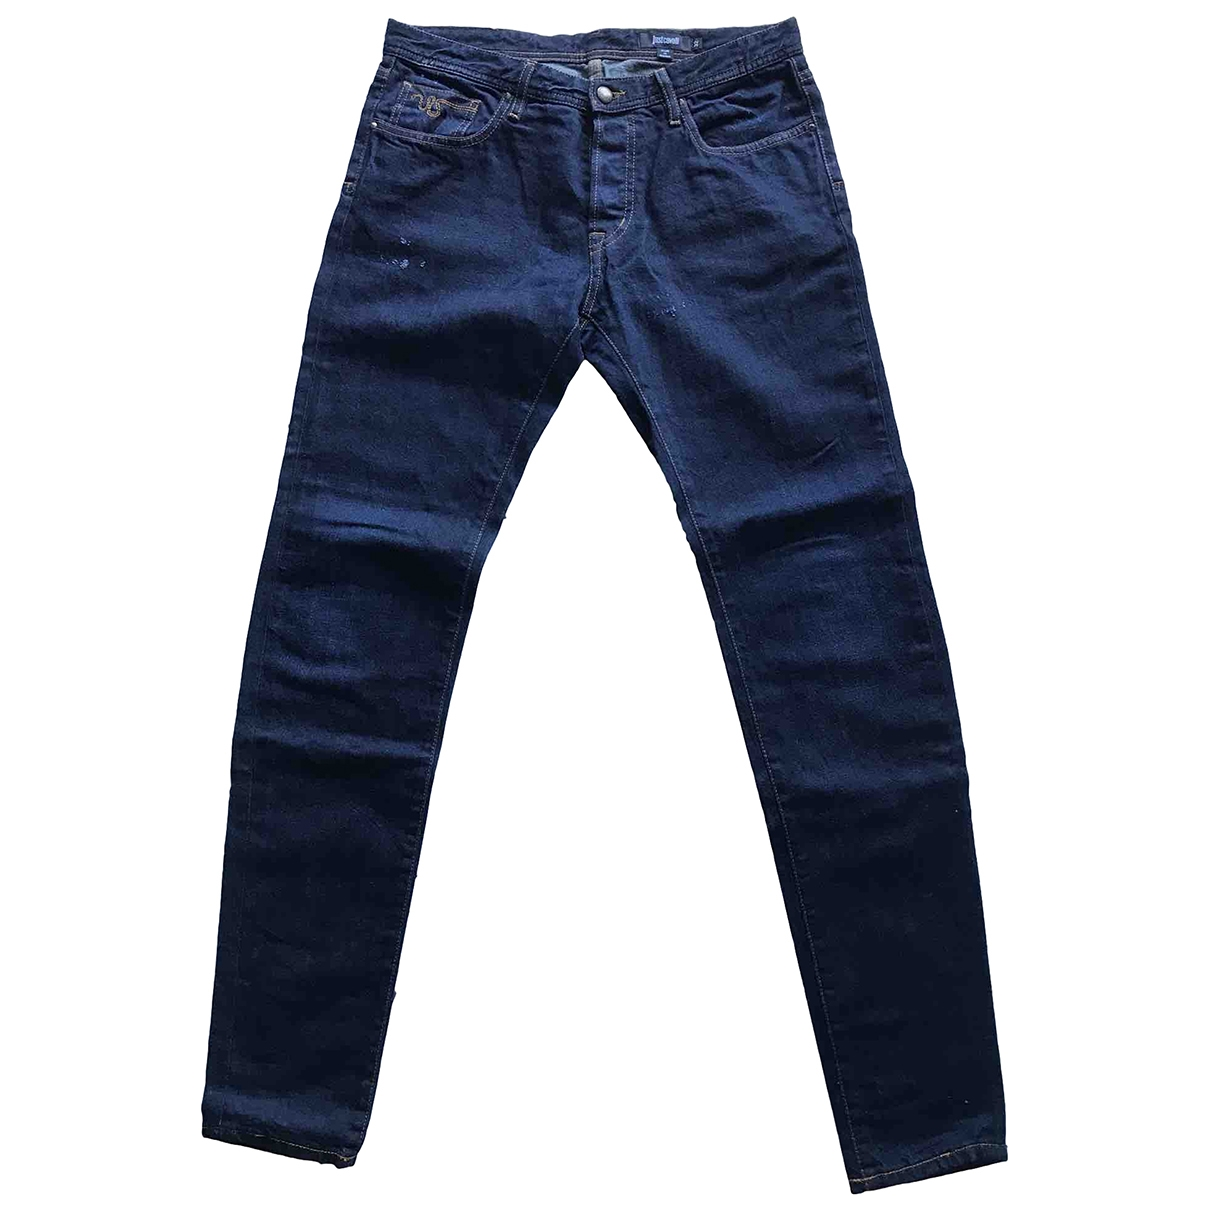 Just Cavalli \N Blue Cotton Jeans for Men 32 US